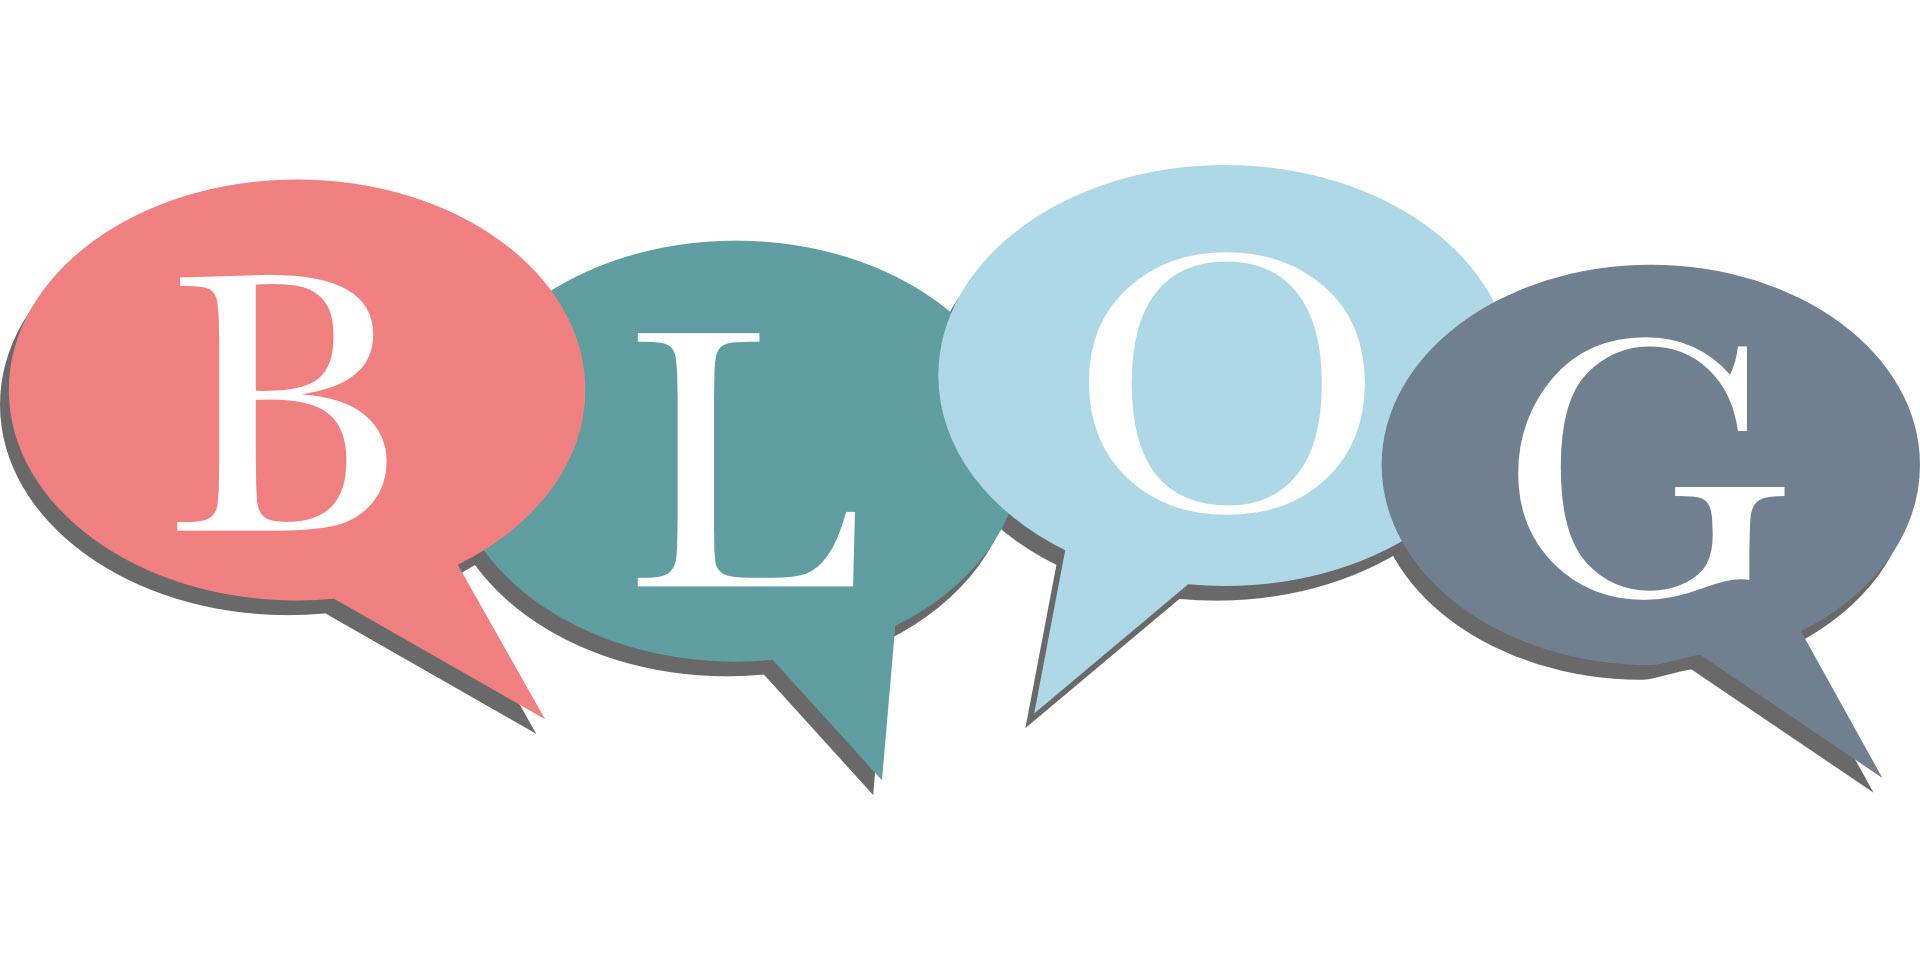 blog marco karch litze leutesheim kehl ortenau offenburg websites homepage content social media marketing